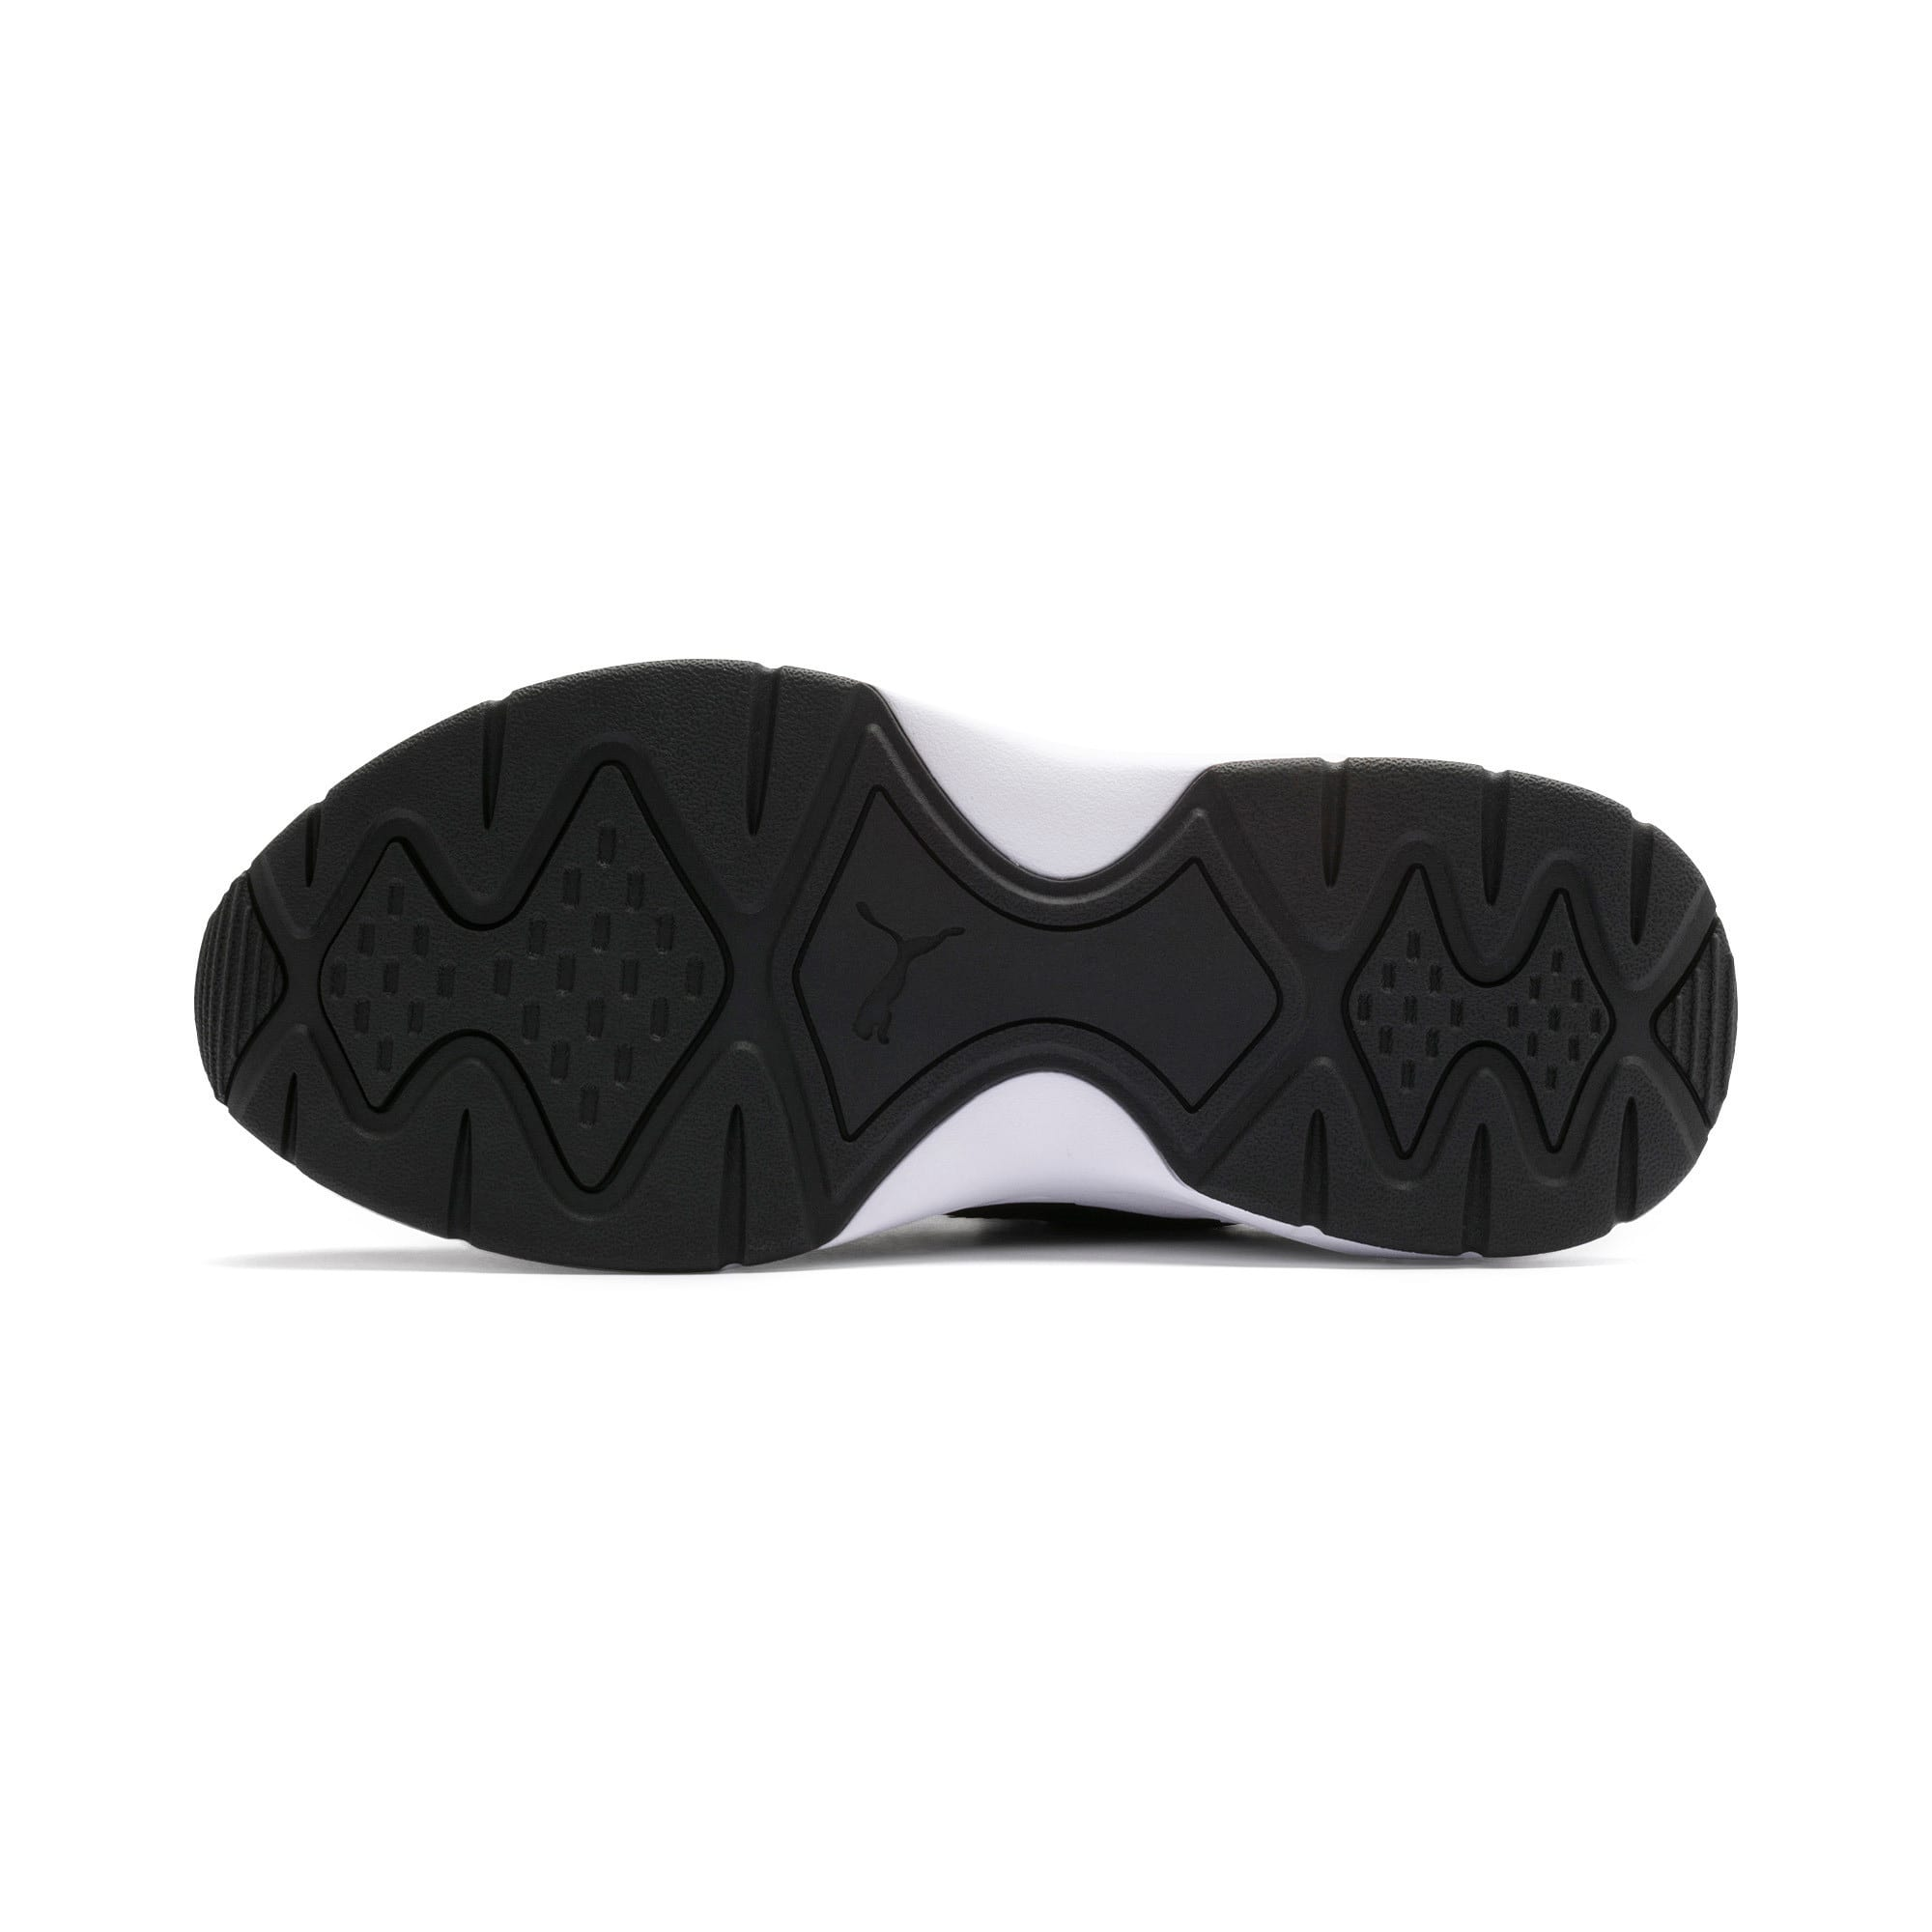 Thumbnail 4 of Nucleus Youth Sneaker, Puma Black-Puma Black, medium